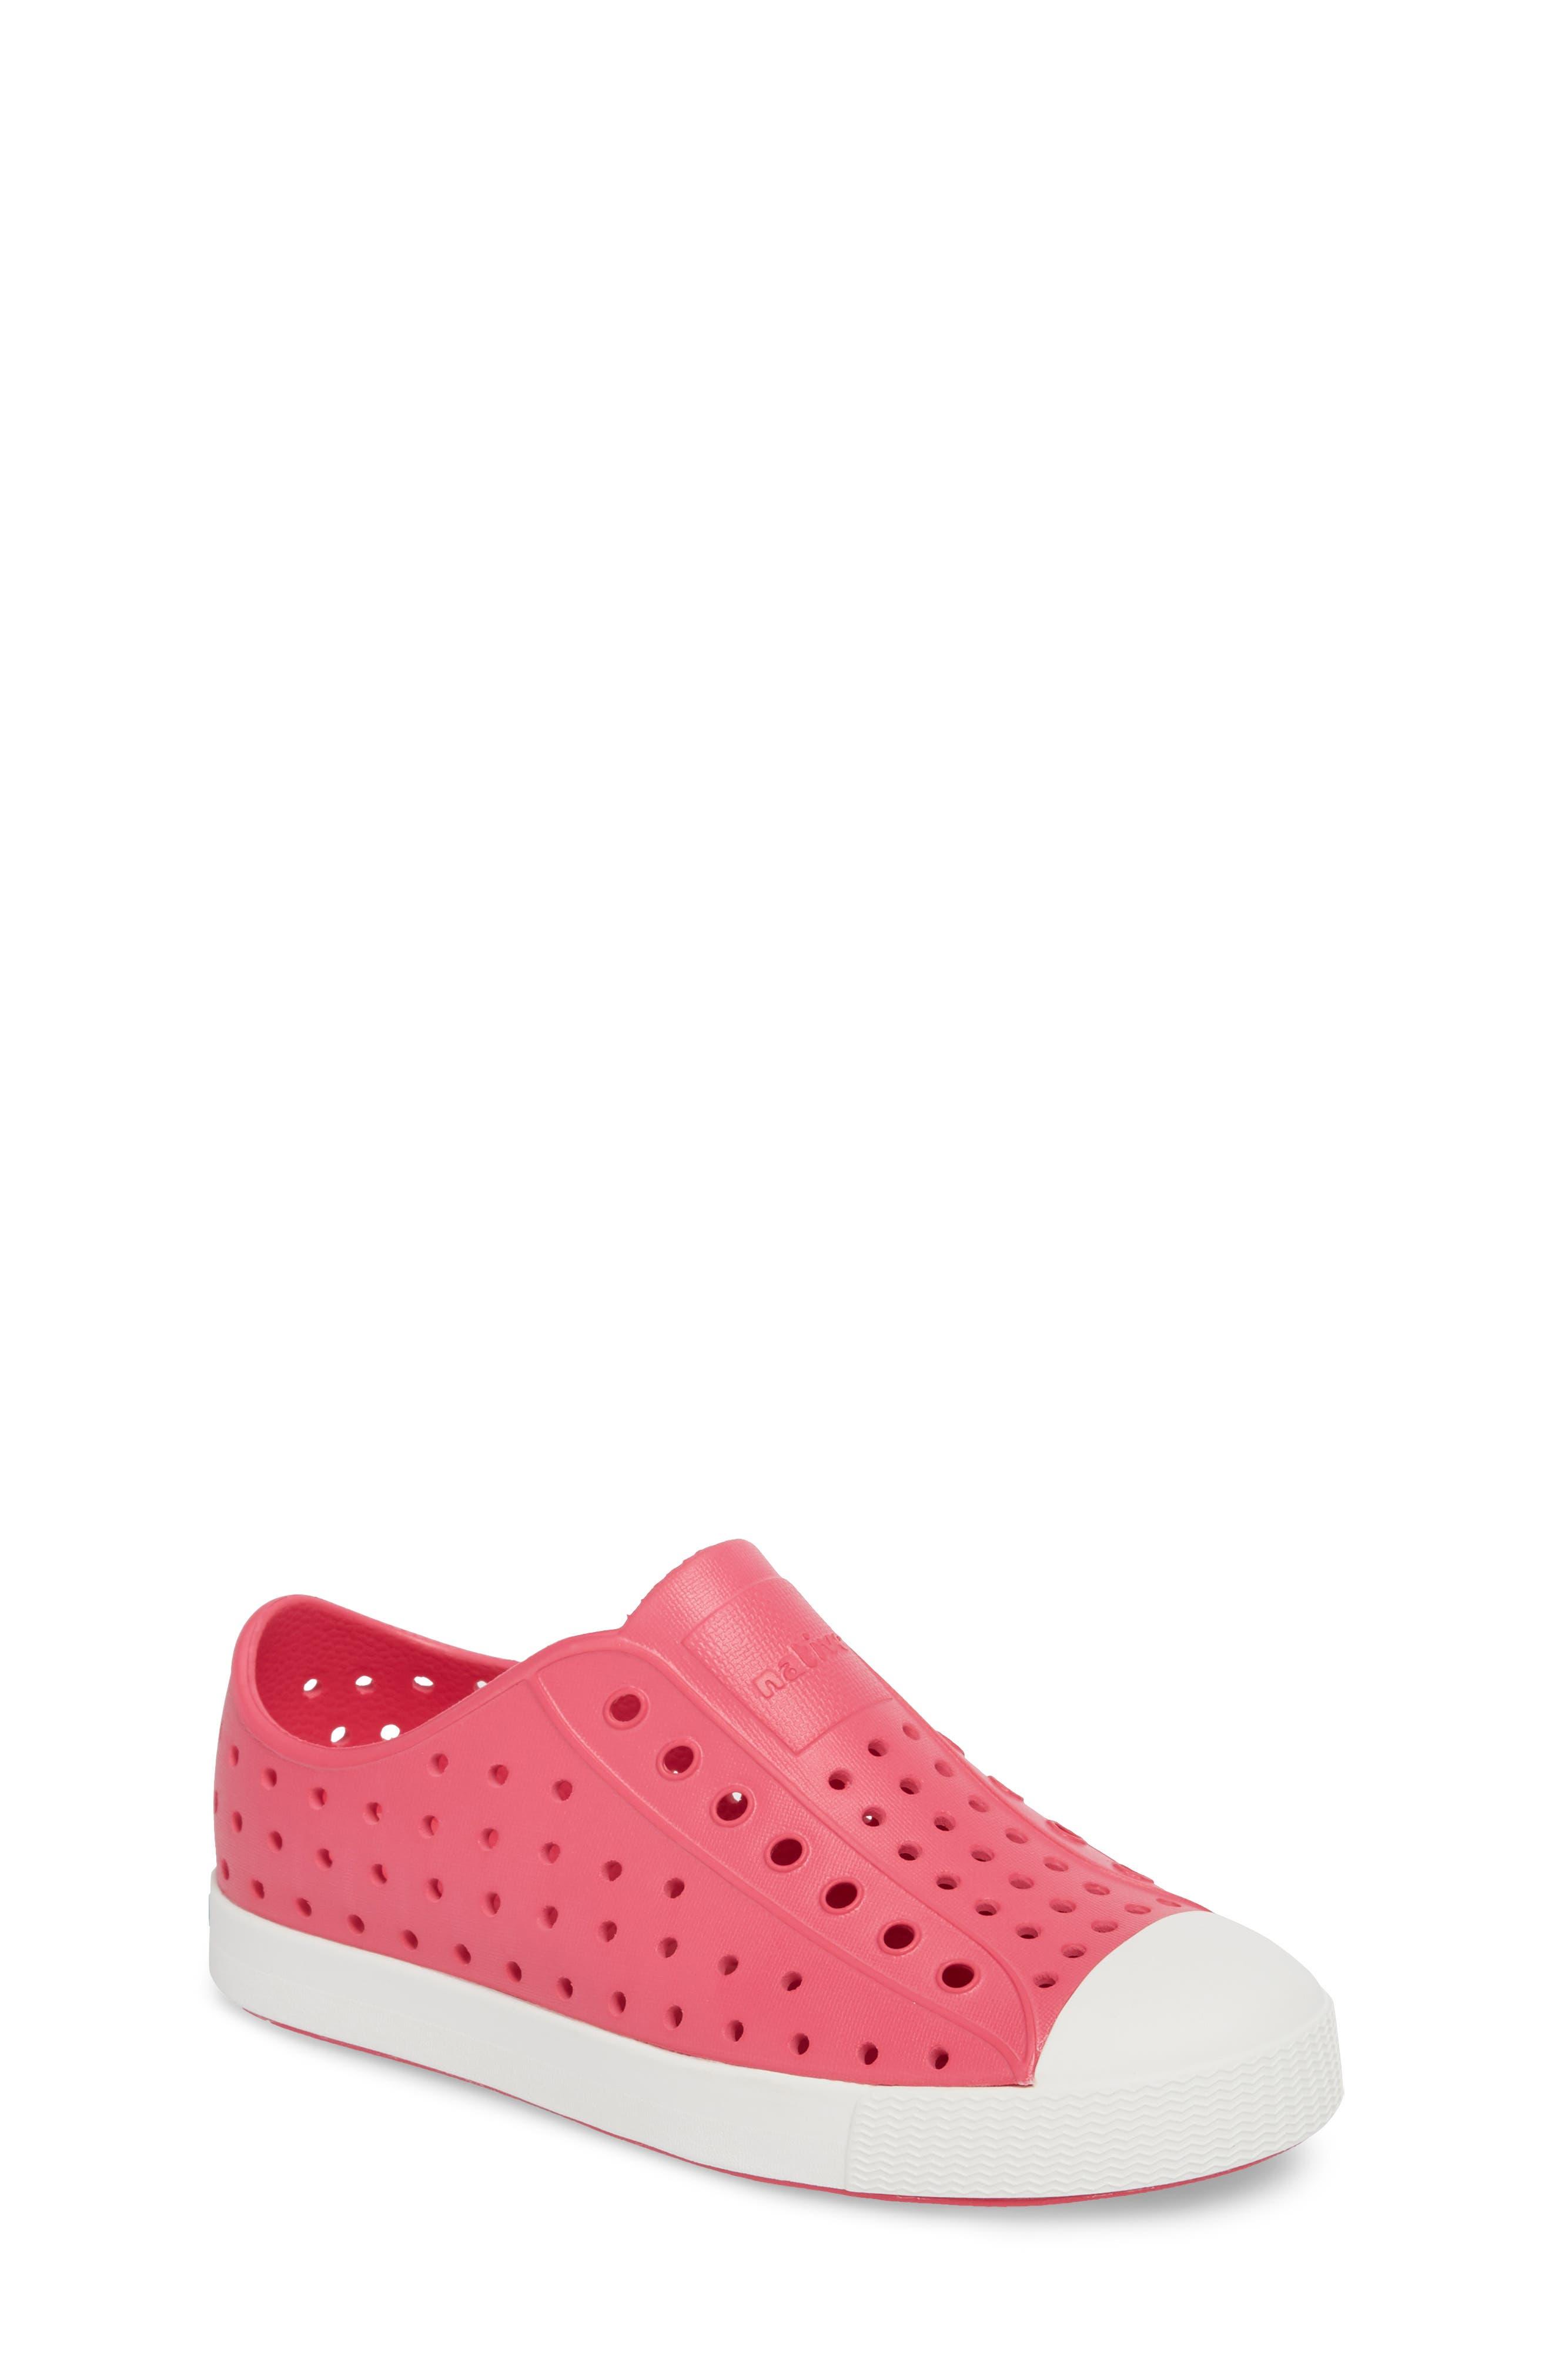 'Jefferson' Water Friendly Slip-On Sneaker,                             Main thumbnail 23, color,